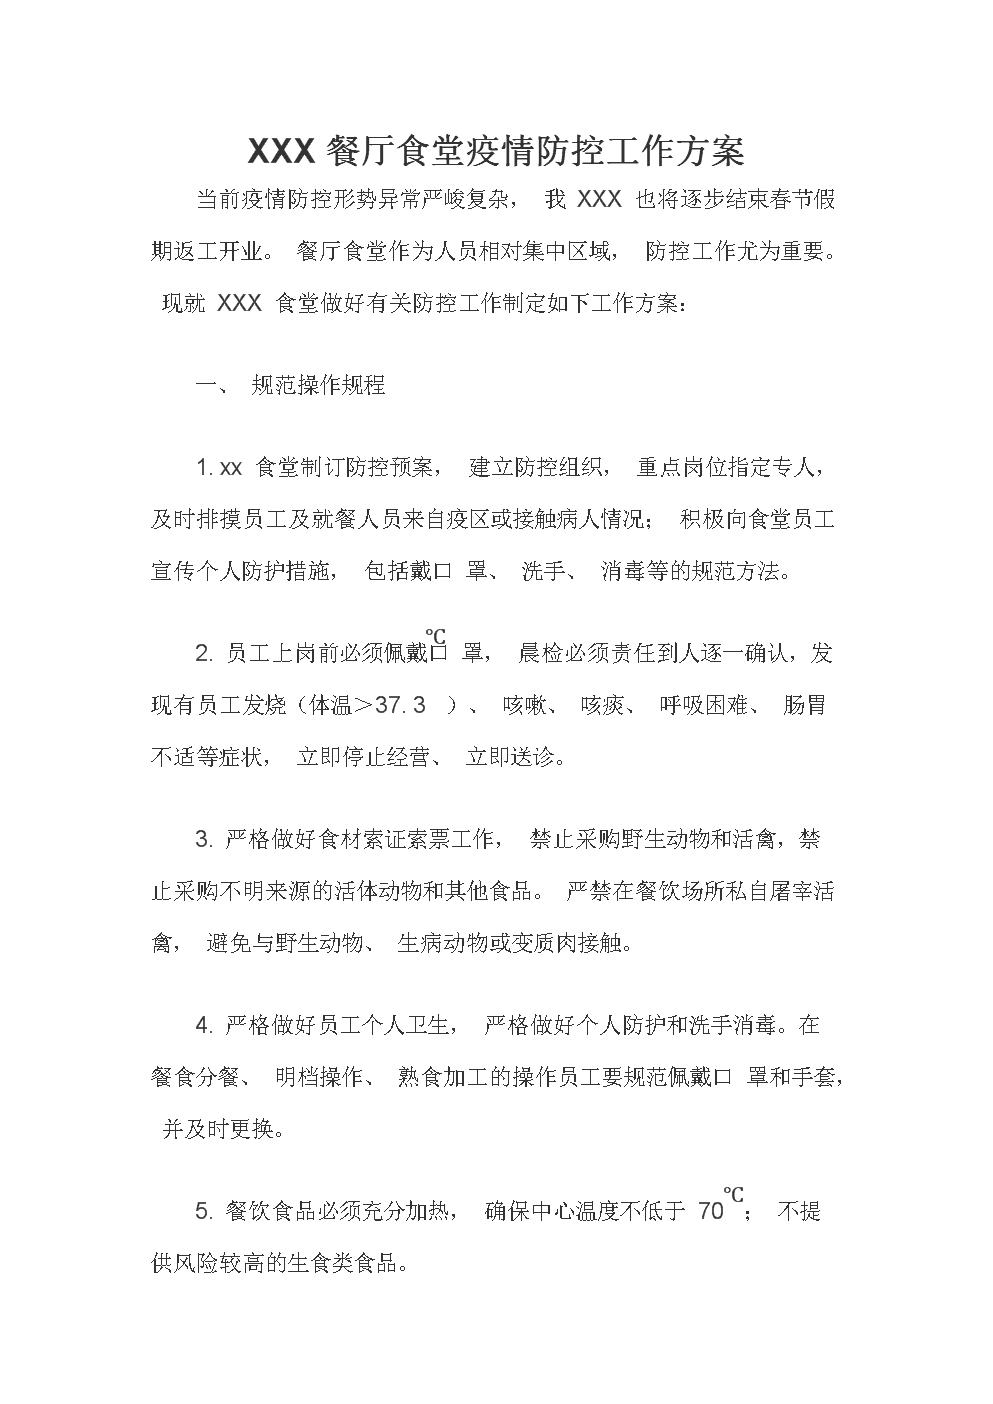 XXX餐厅食堂疫情防控工作方案.docx